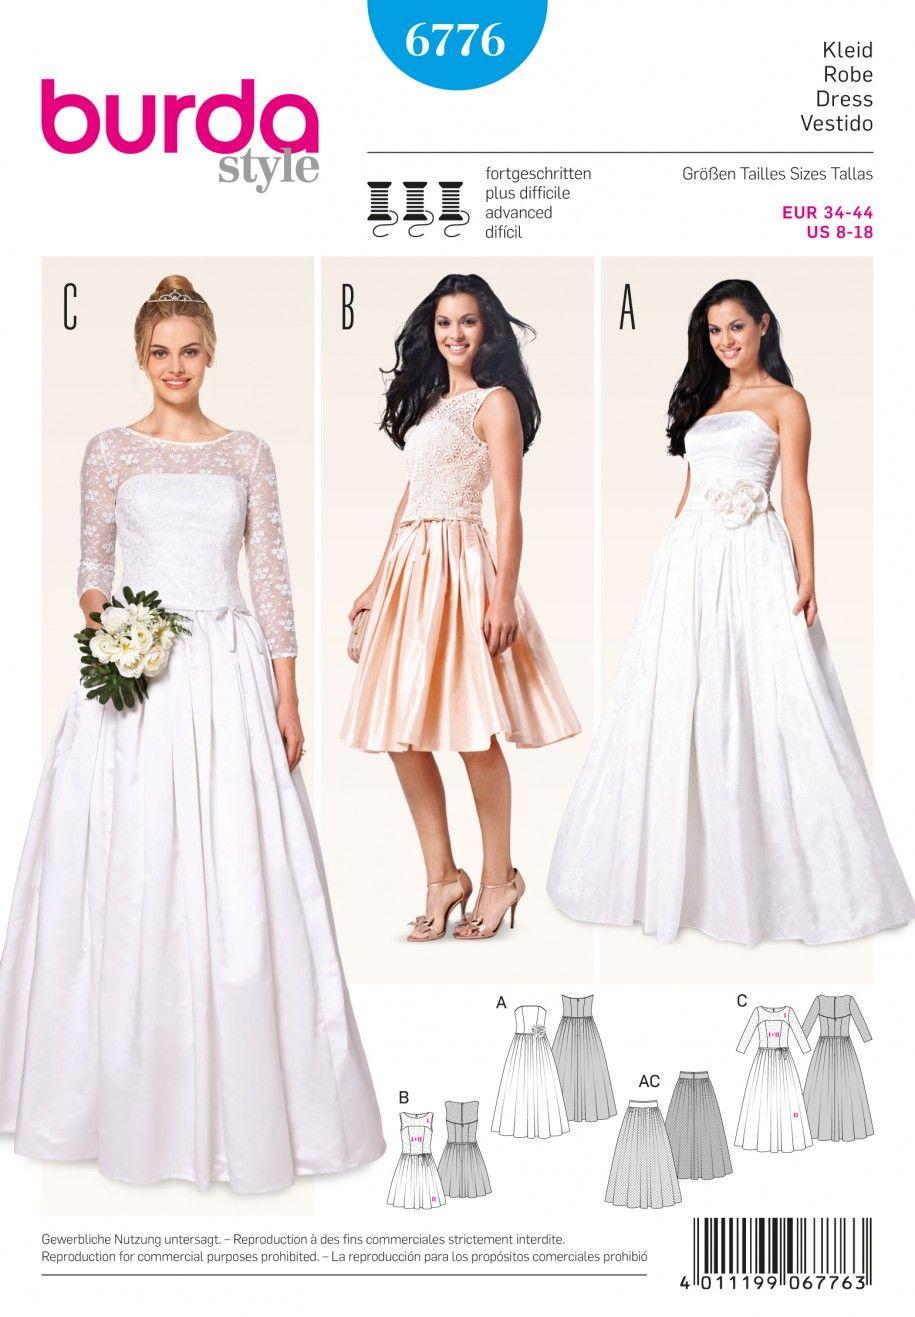 wedding dress sewing patterns Burda B Evening Bridal Wear Sewing Pattern